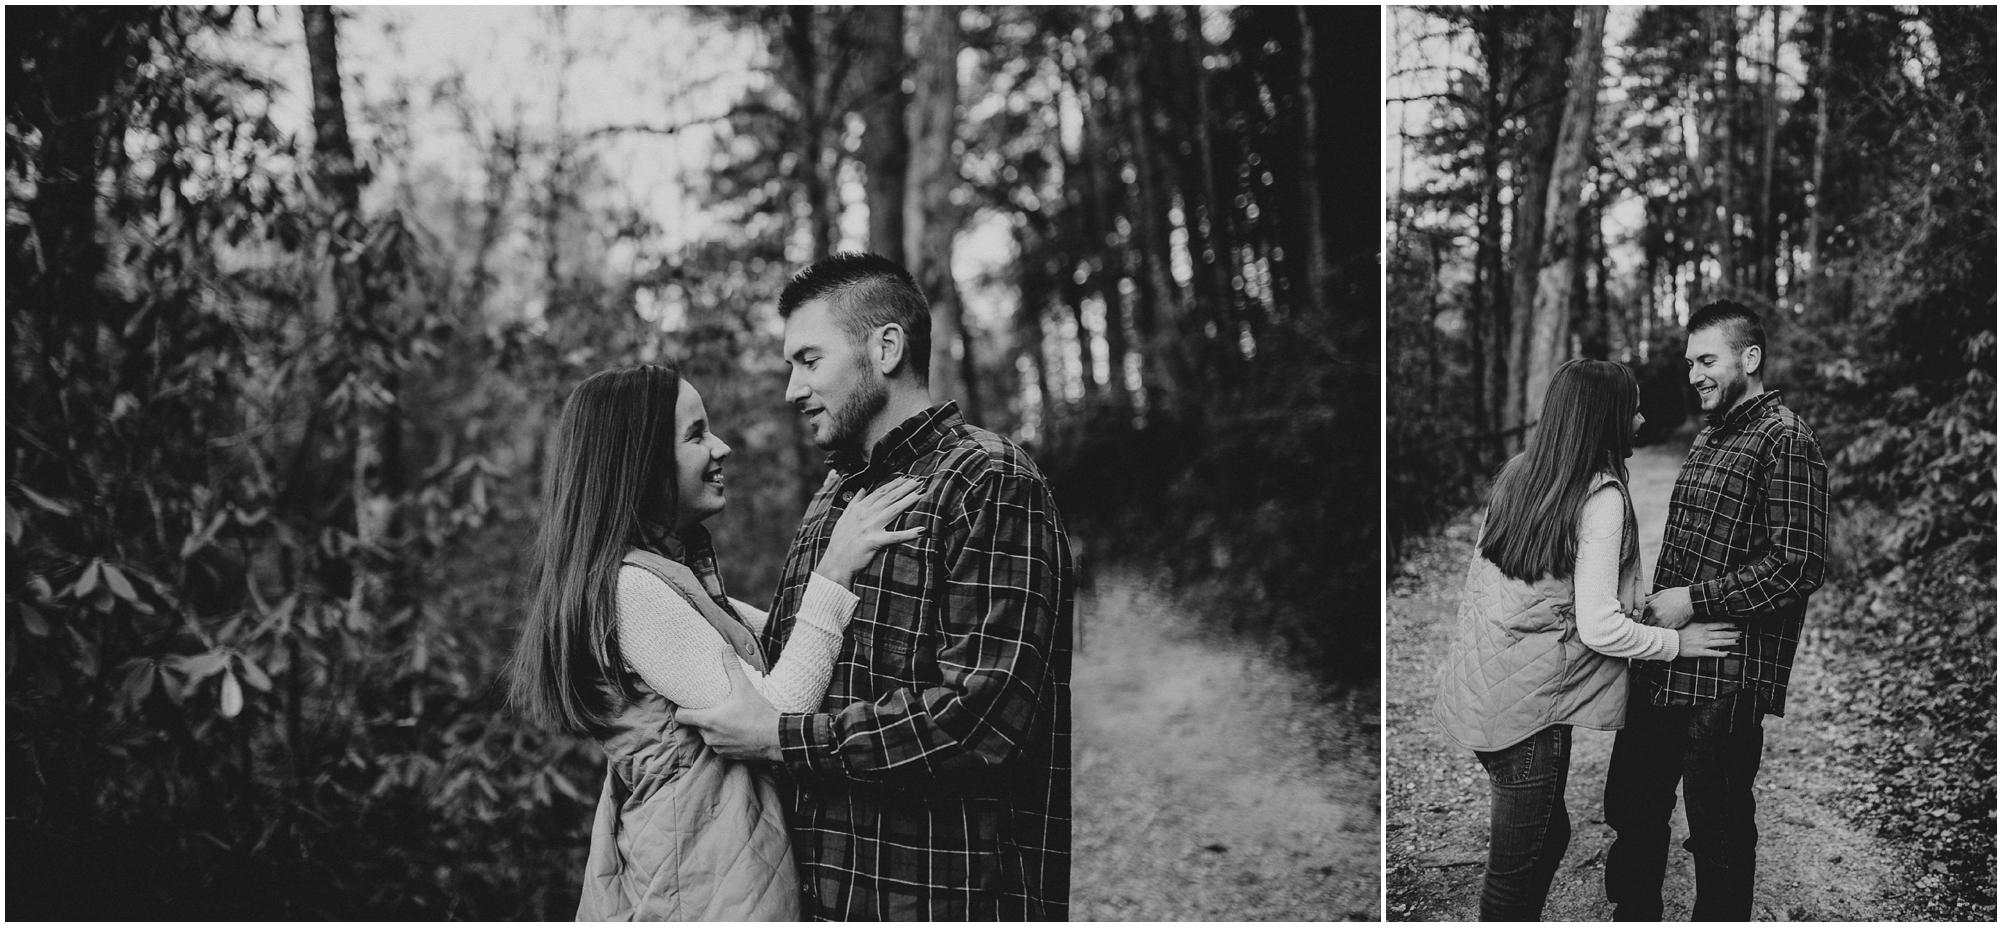 Linville-Falls-Engagement-avonne-Photography-15.jpg